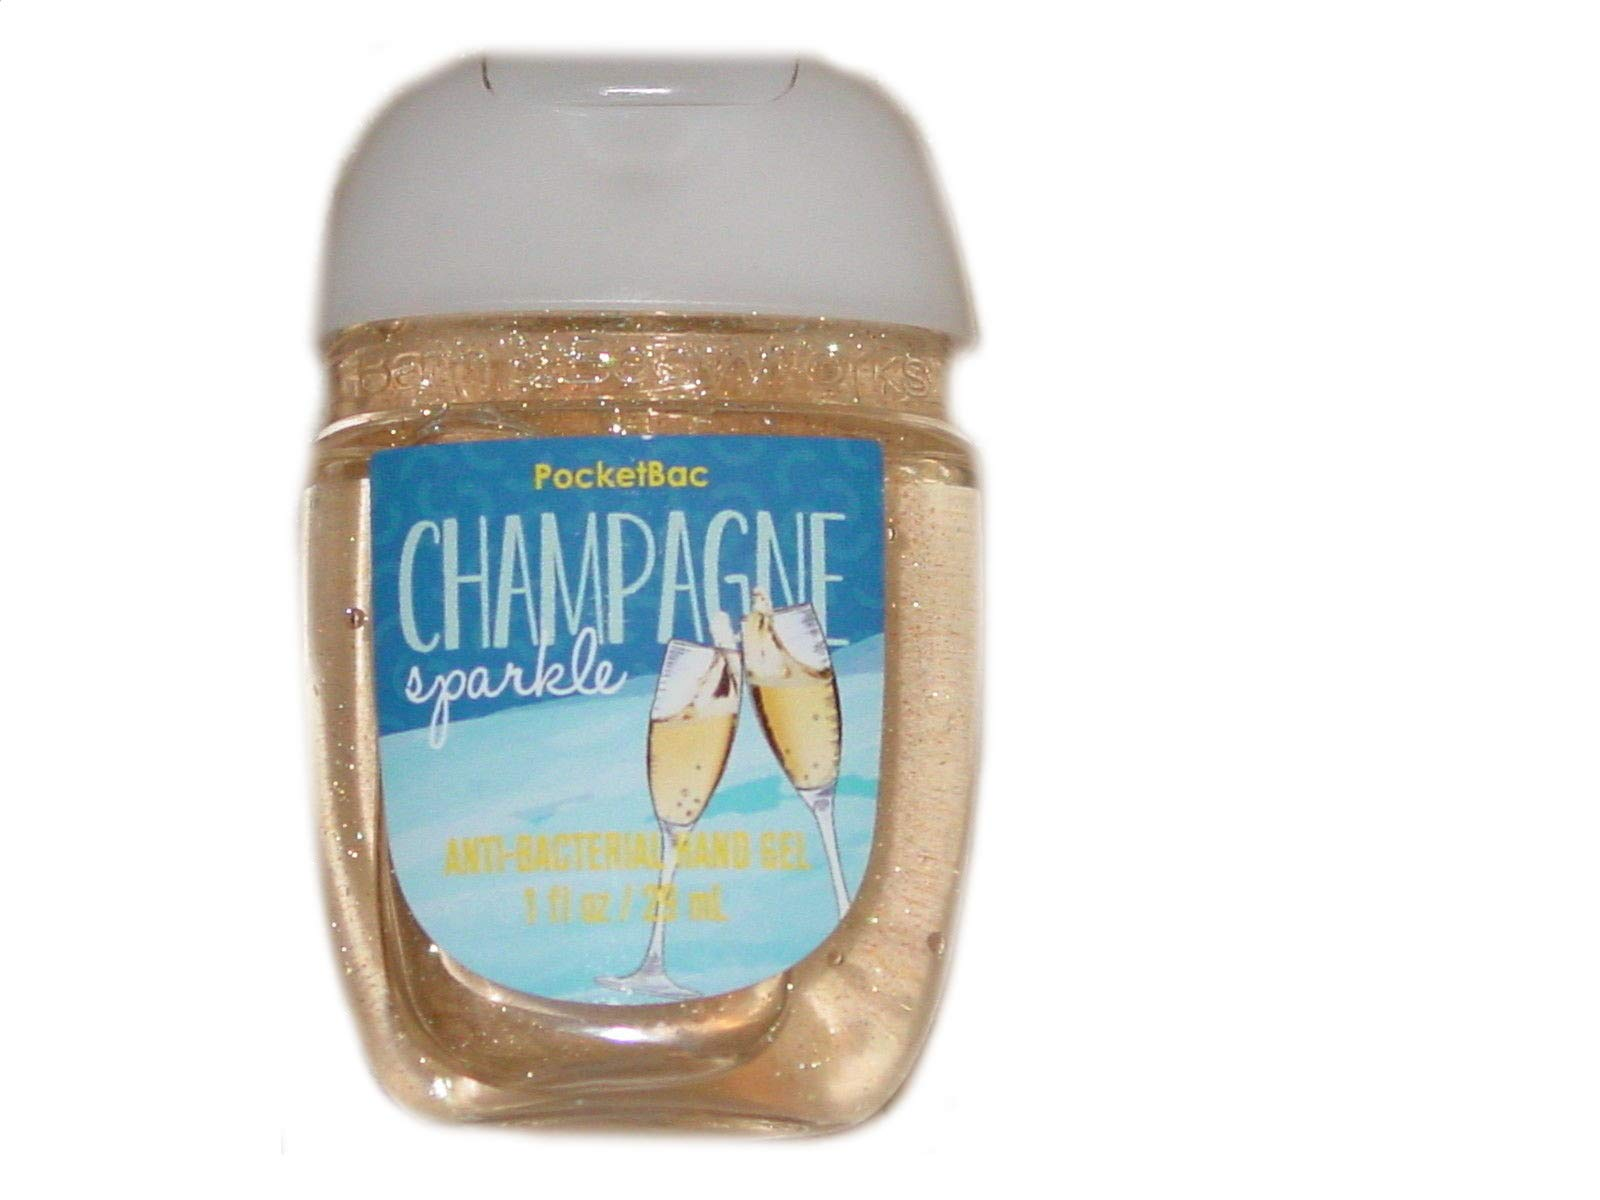 Bath Body Works PocketBac Hand Gel Champagne Sparkle 2019